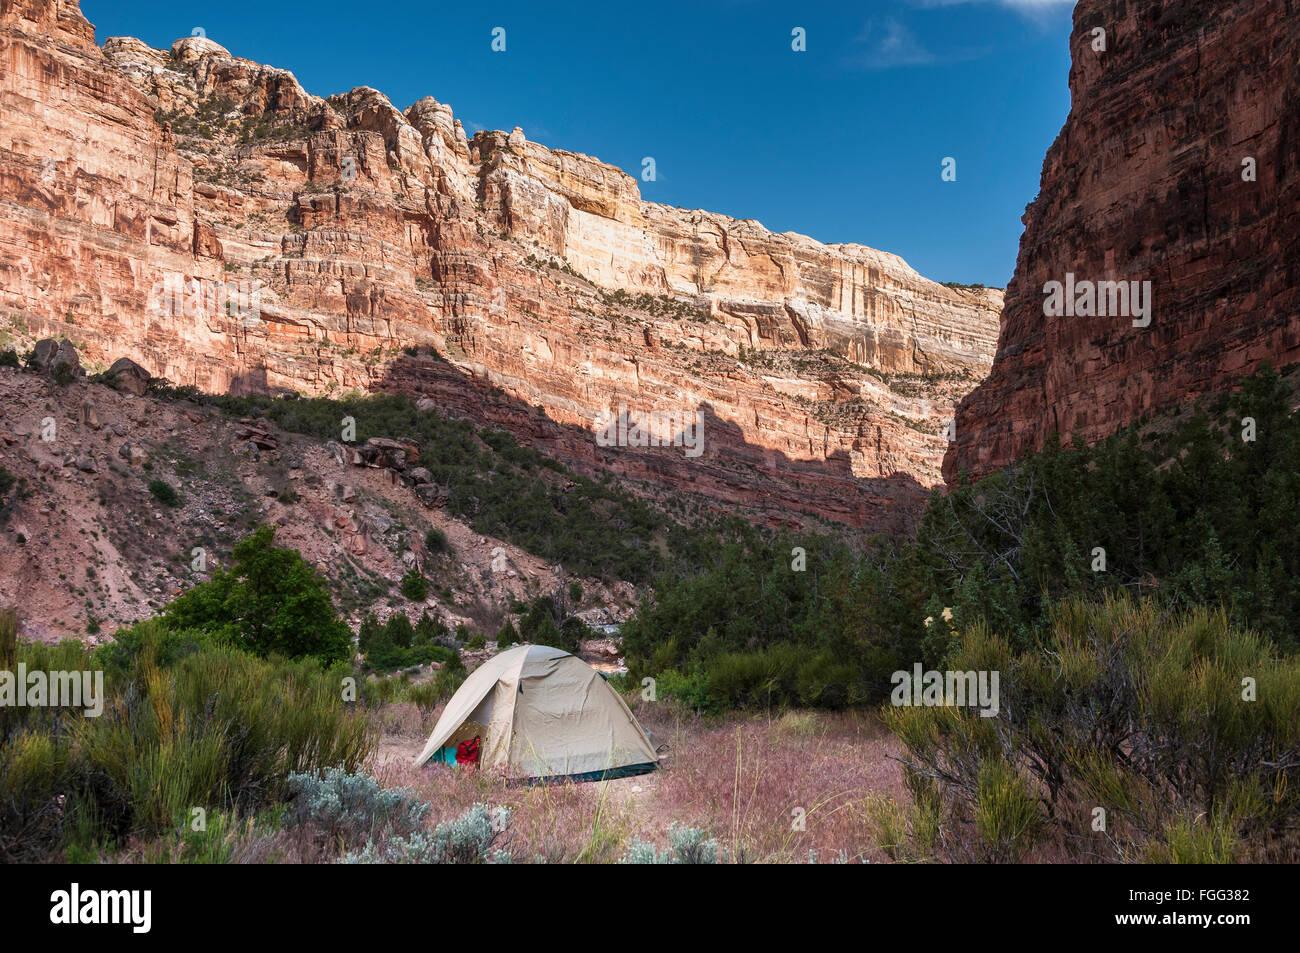 Canyon walls near Big Joe campsite, Yampa River, Dinosaur National Monument, Colorado. - Stock Image